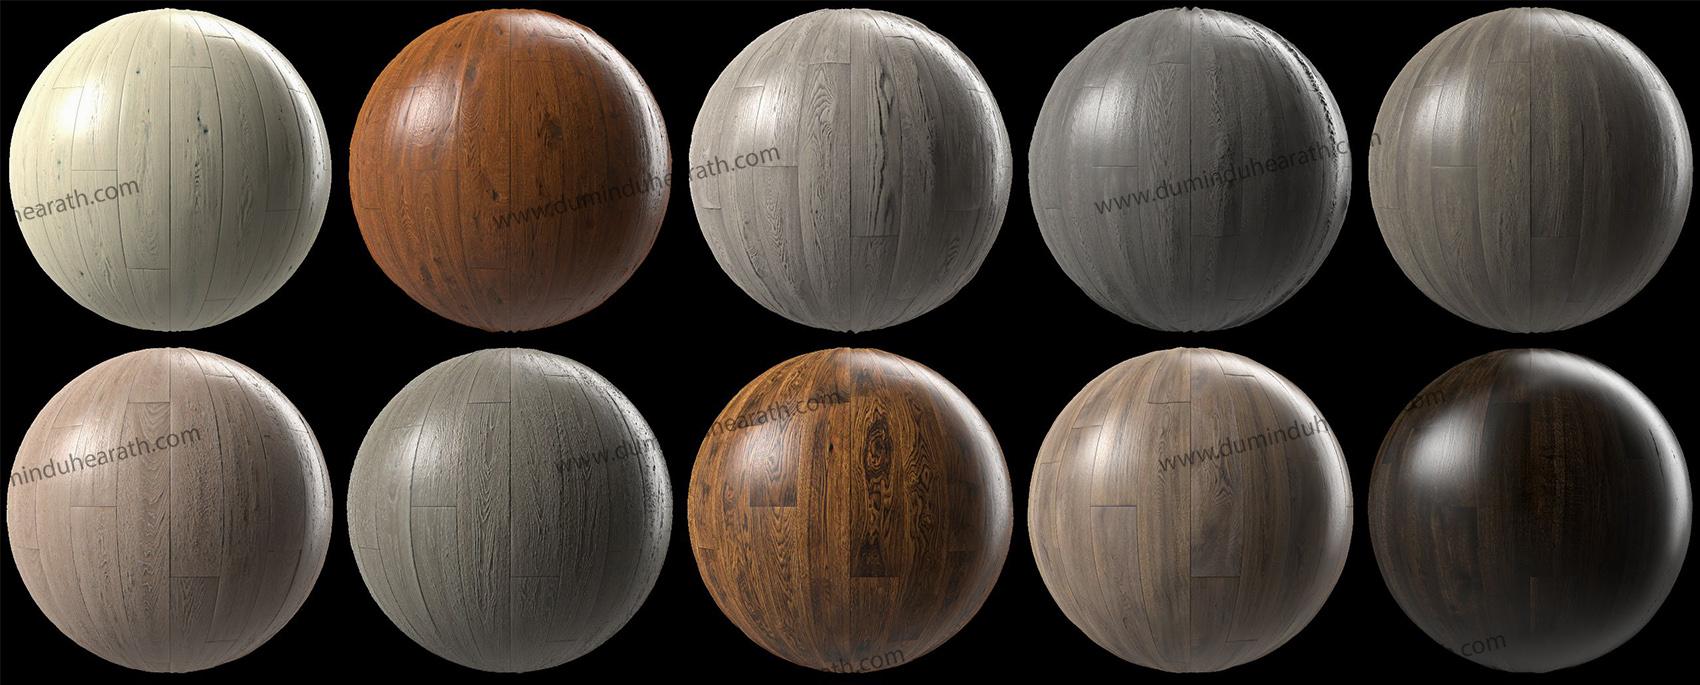 textures created T005-e002 www.dumnduhearath.com